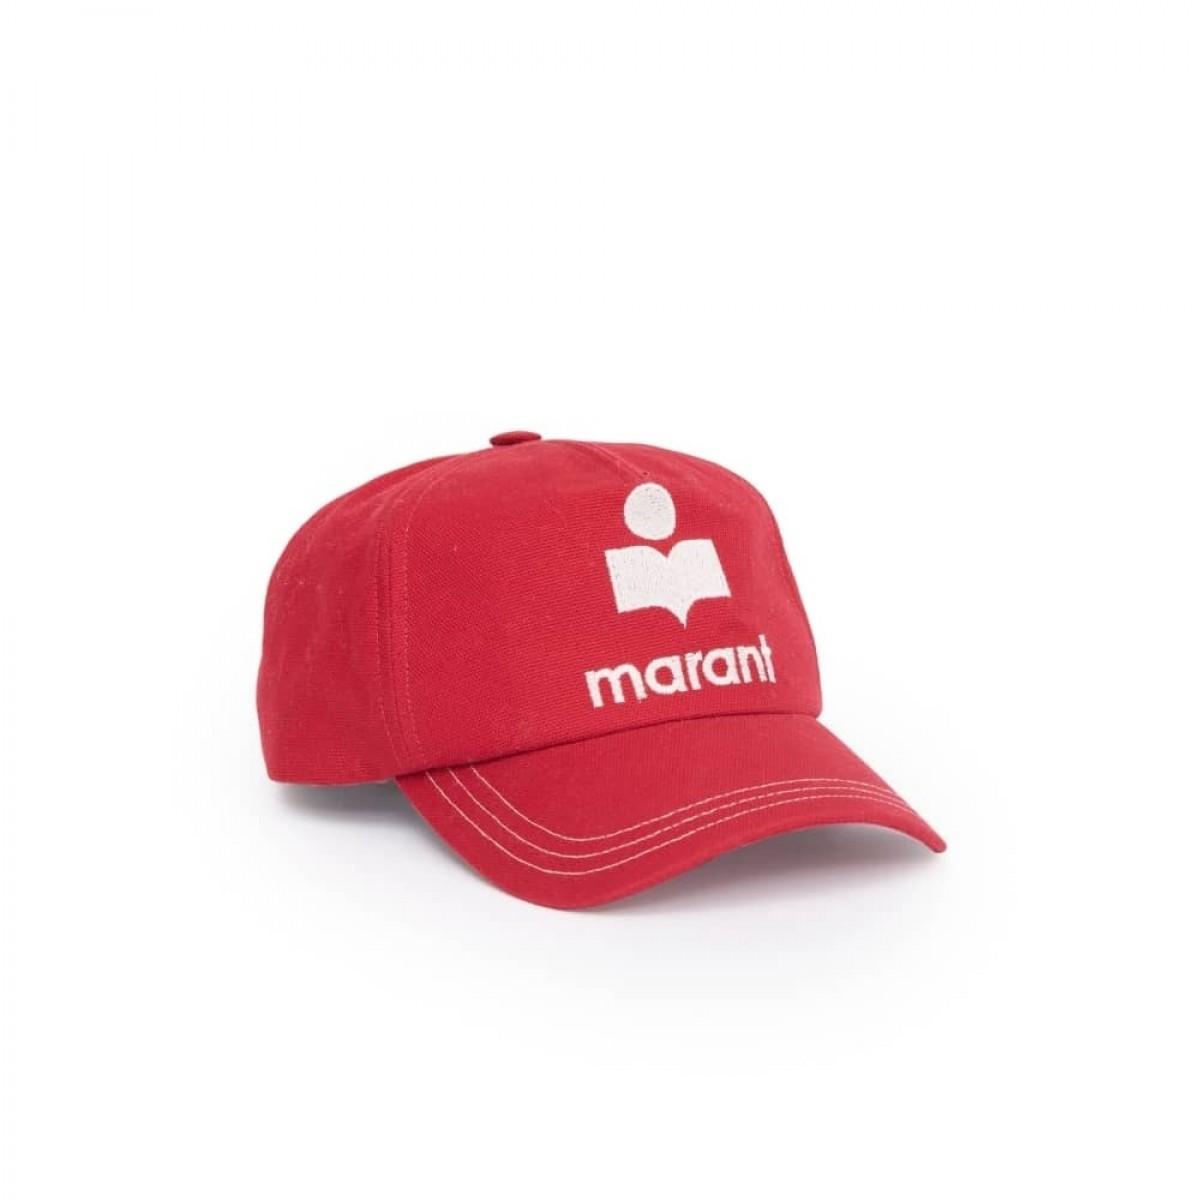 tyron cap - red